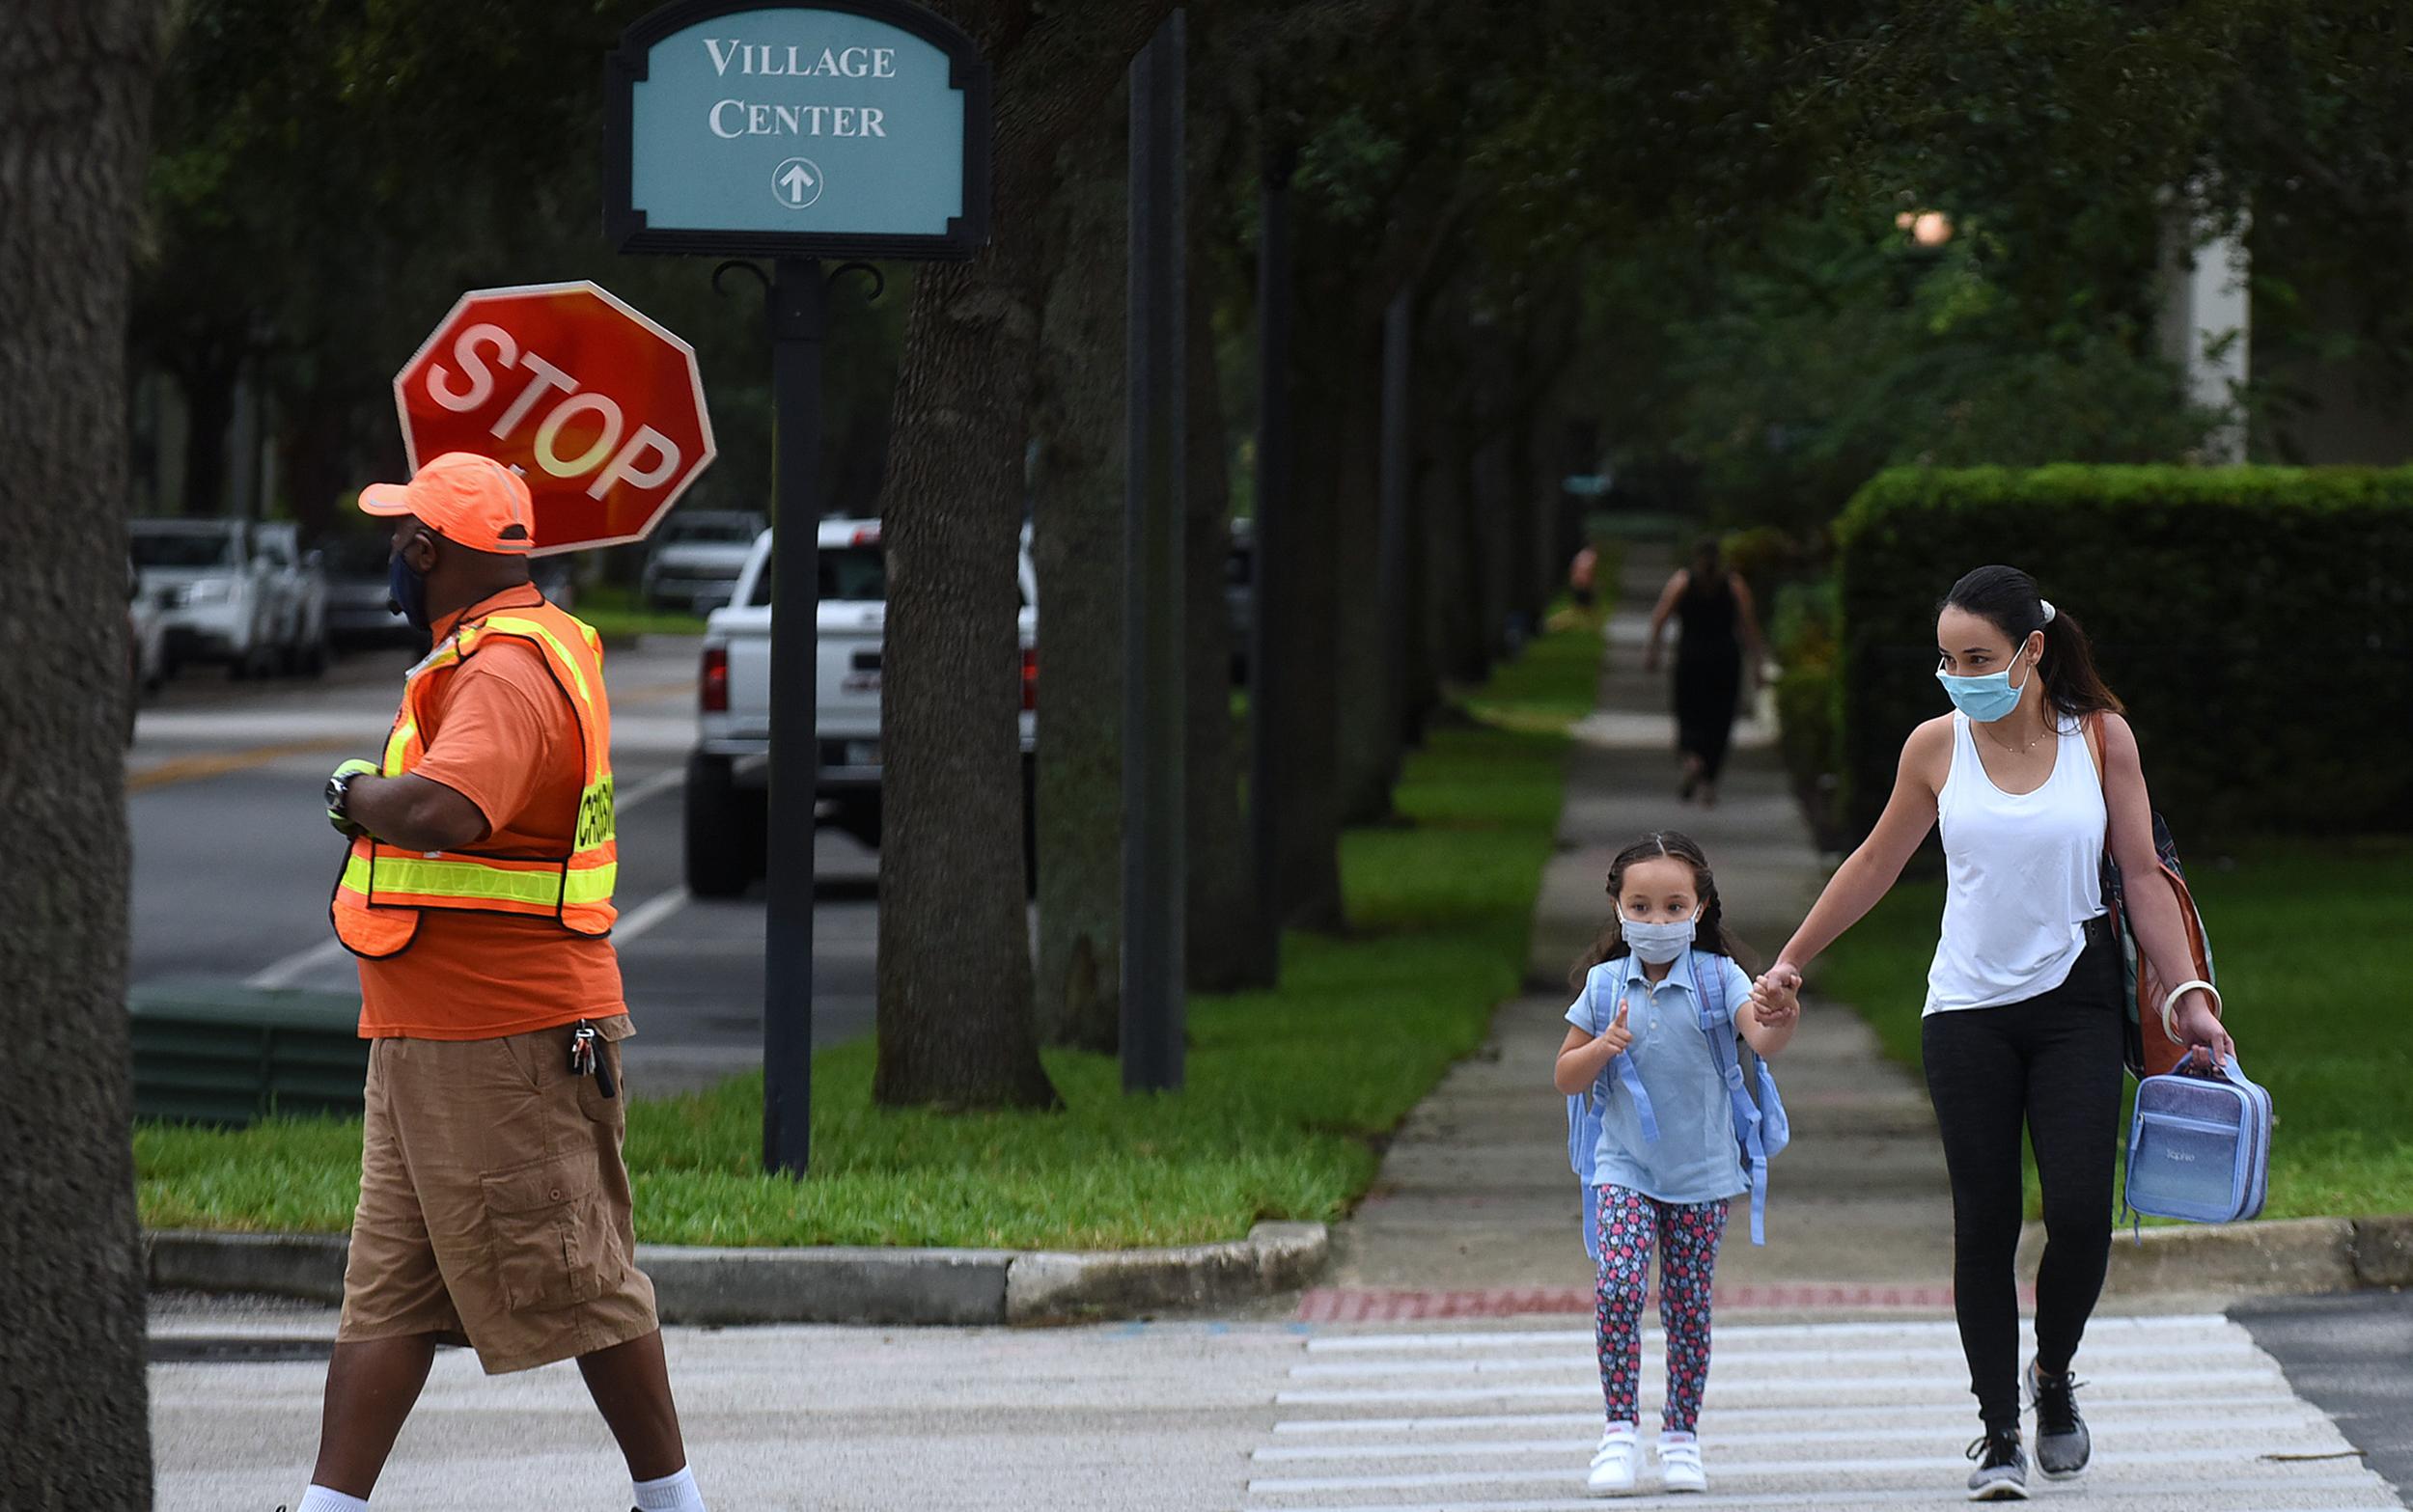 Florida Gov. Ron DeSantis to issue executive order banning mask mandates in schools